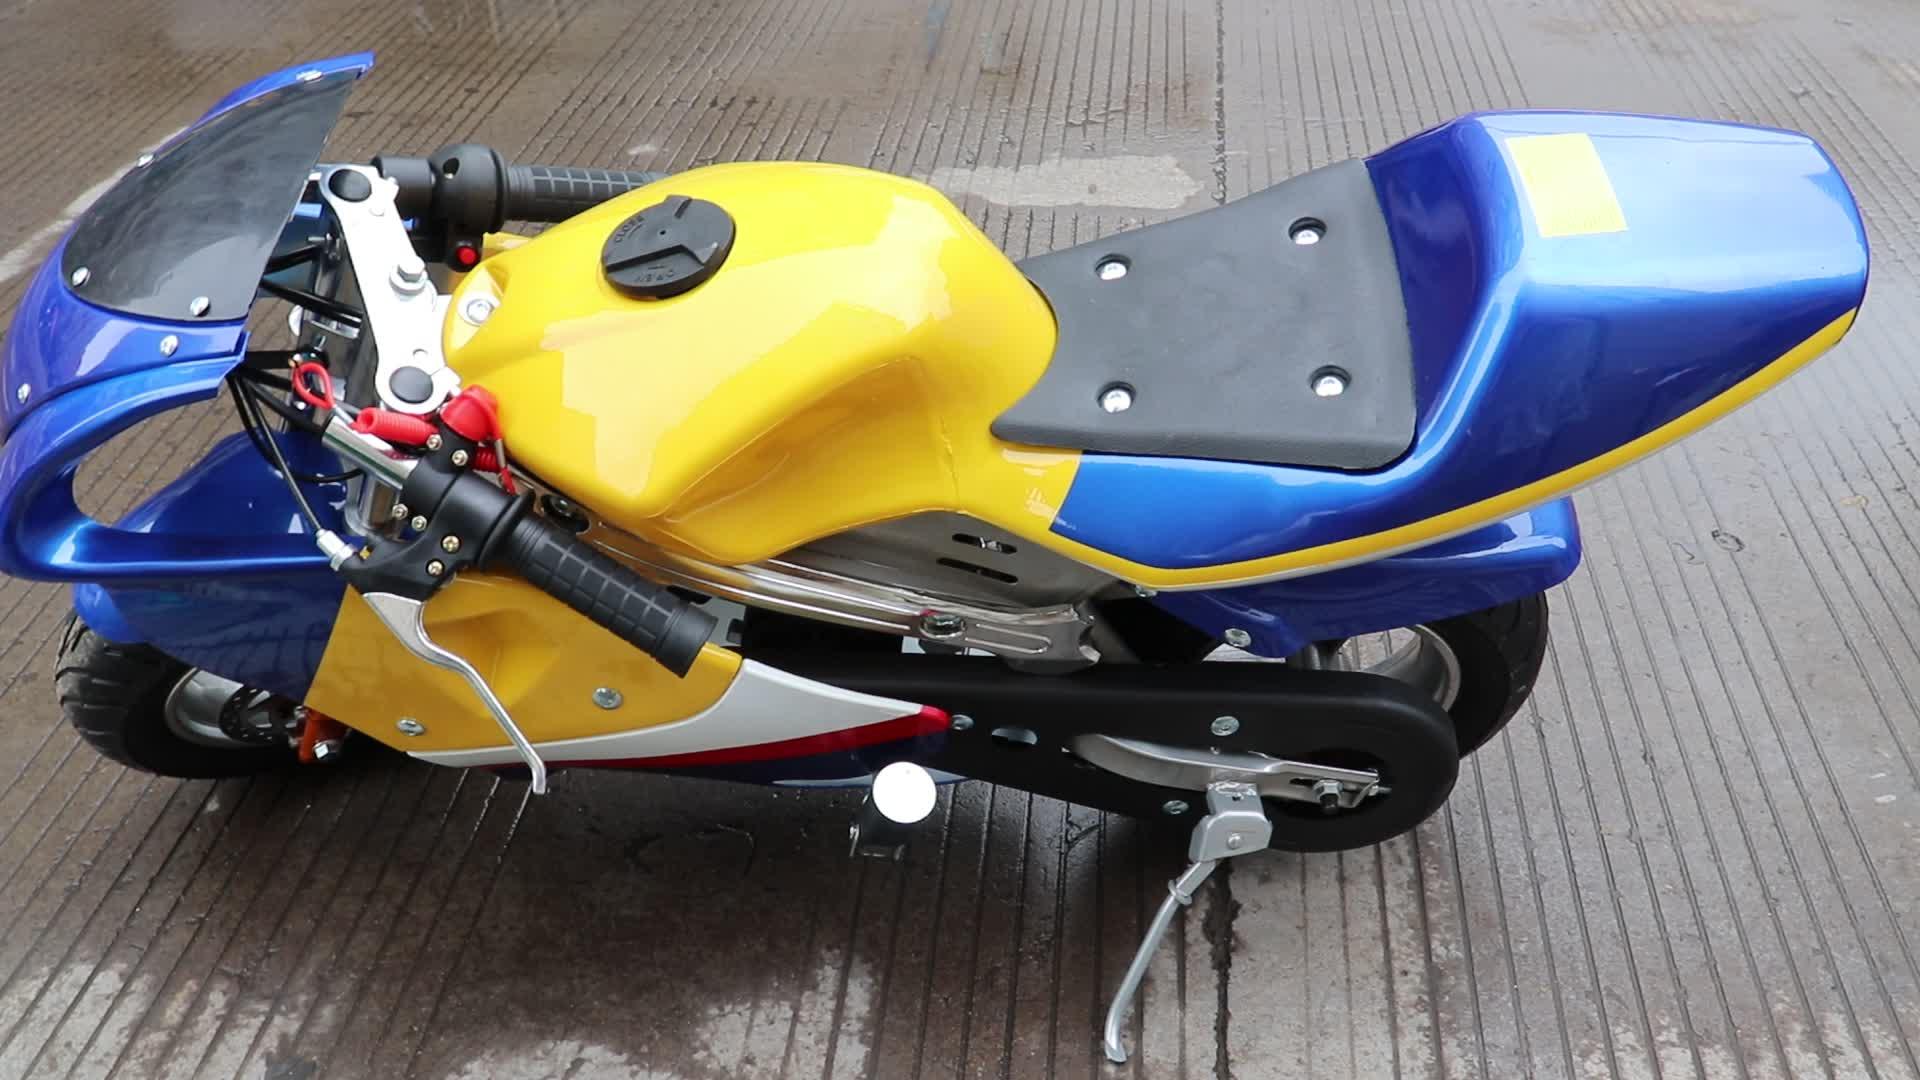 Phyes Mini Pocket Bike Motorcycle 50cc Pocket Bike 49cc